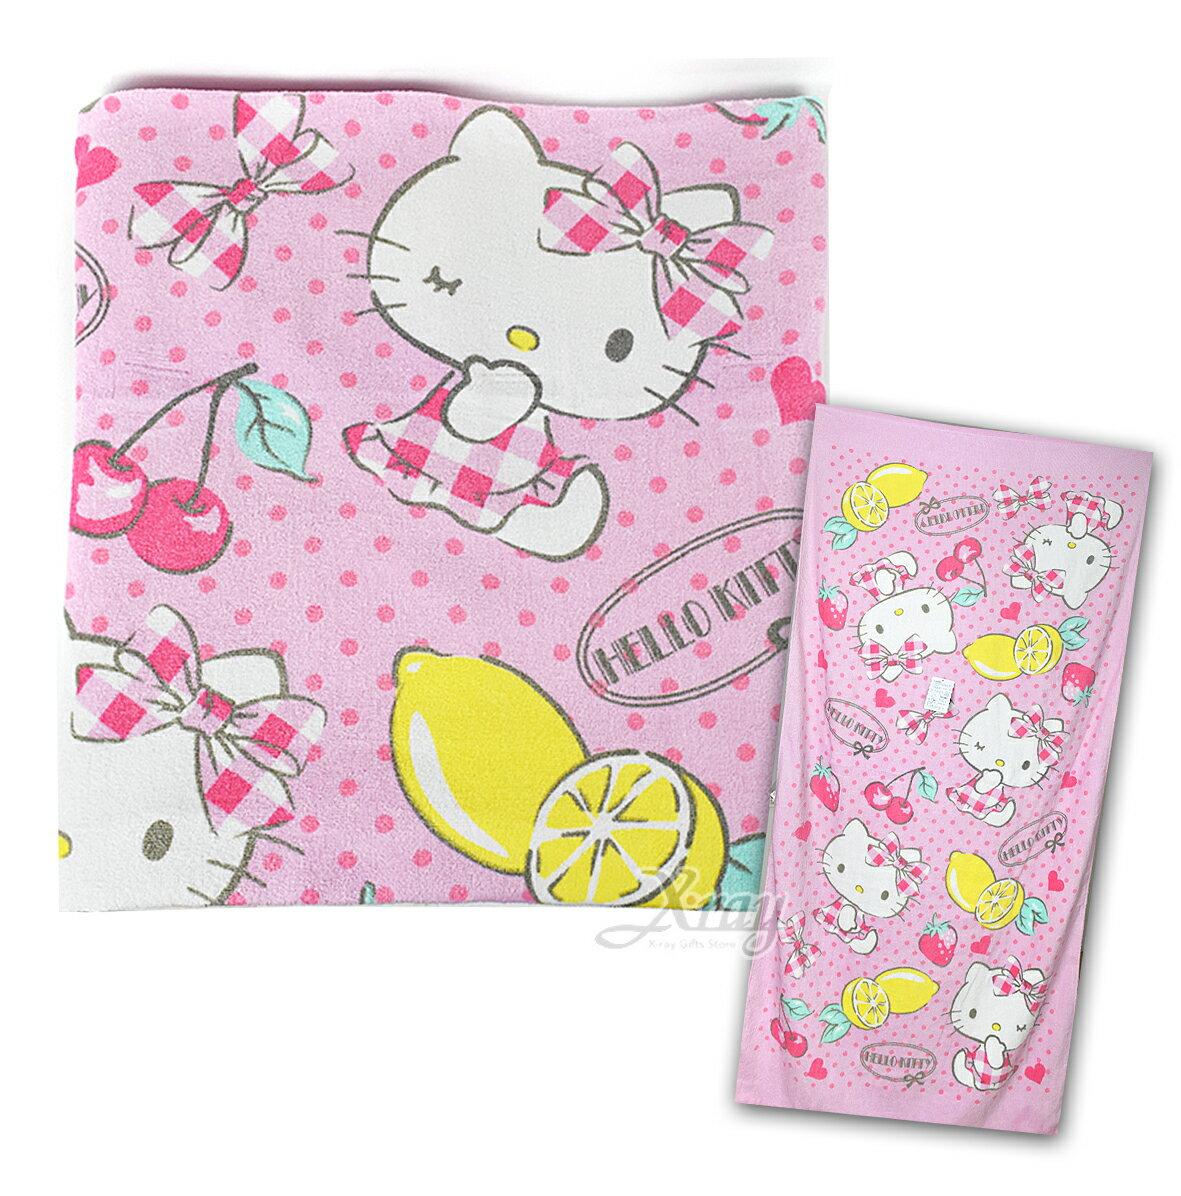 X射線【C259876】KITTY莓果浴巾,擦手巾/洗澡巾/紗布巾/毛巾/開學必備